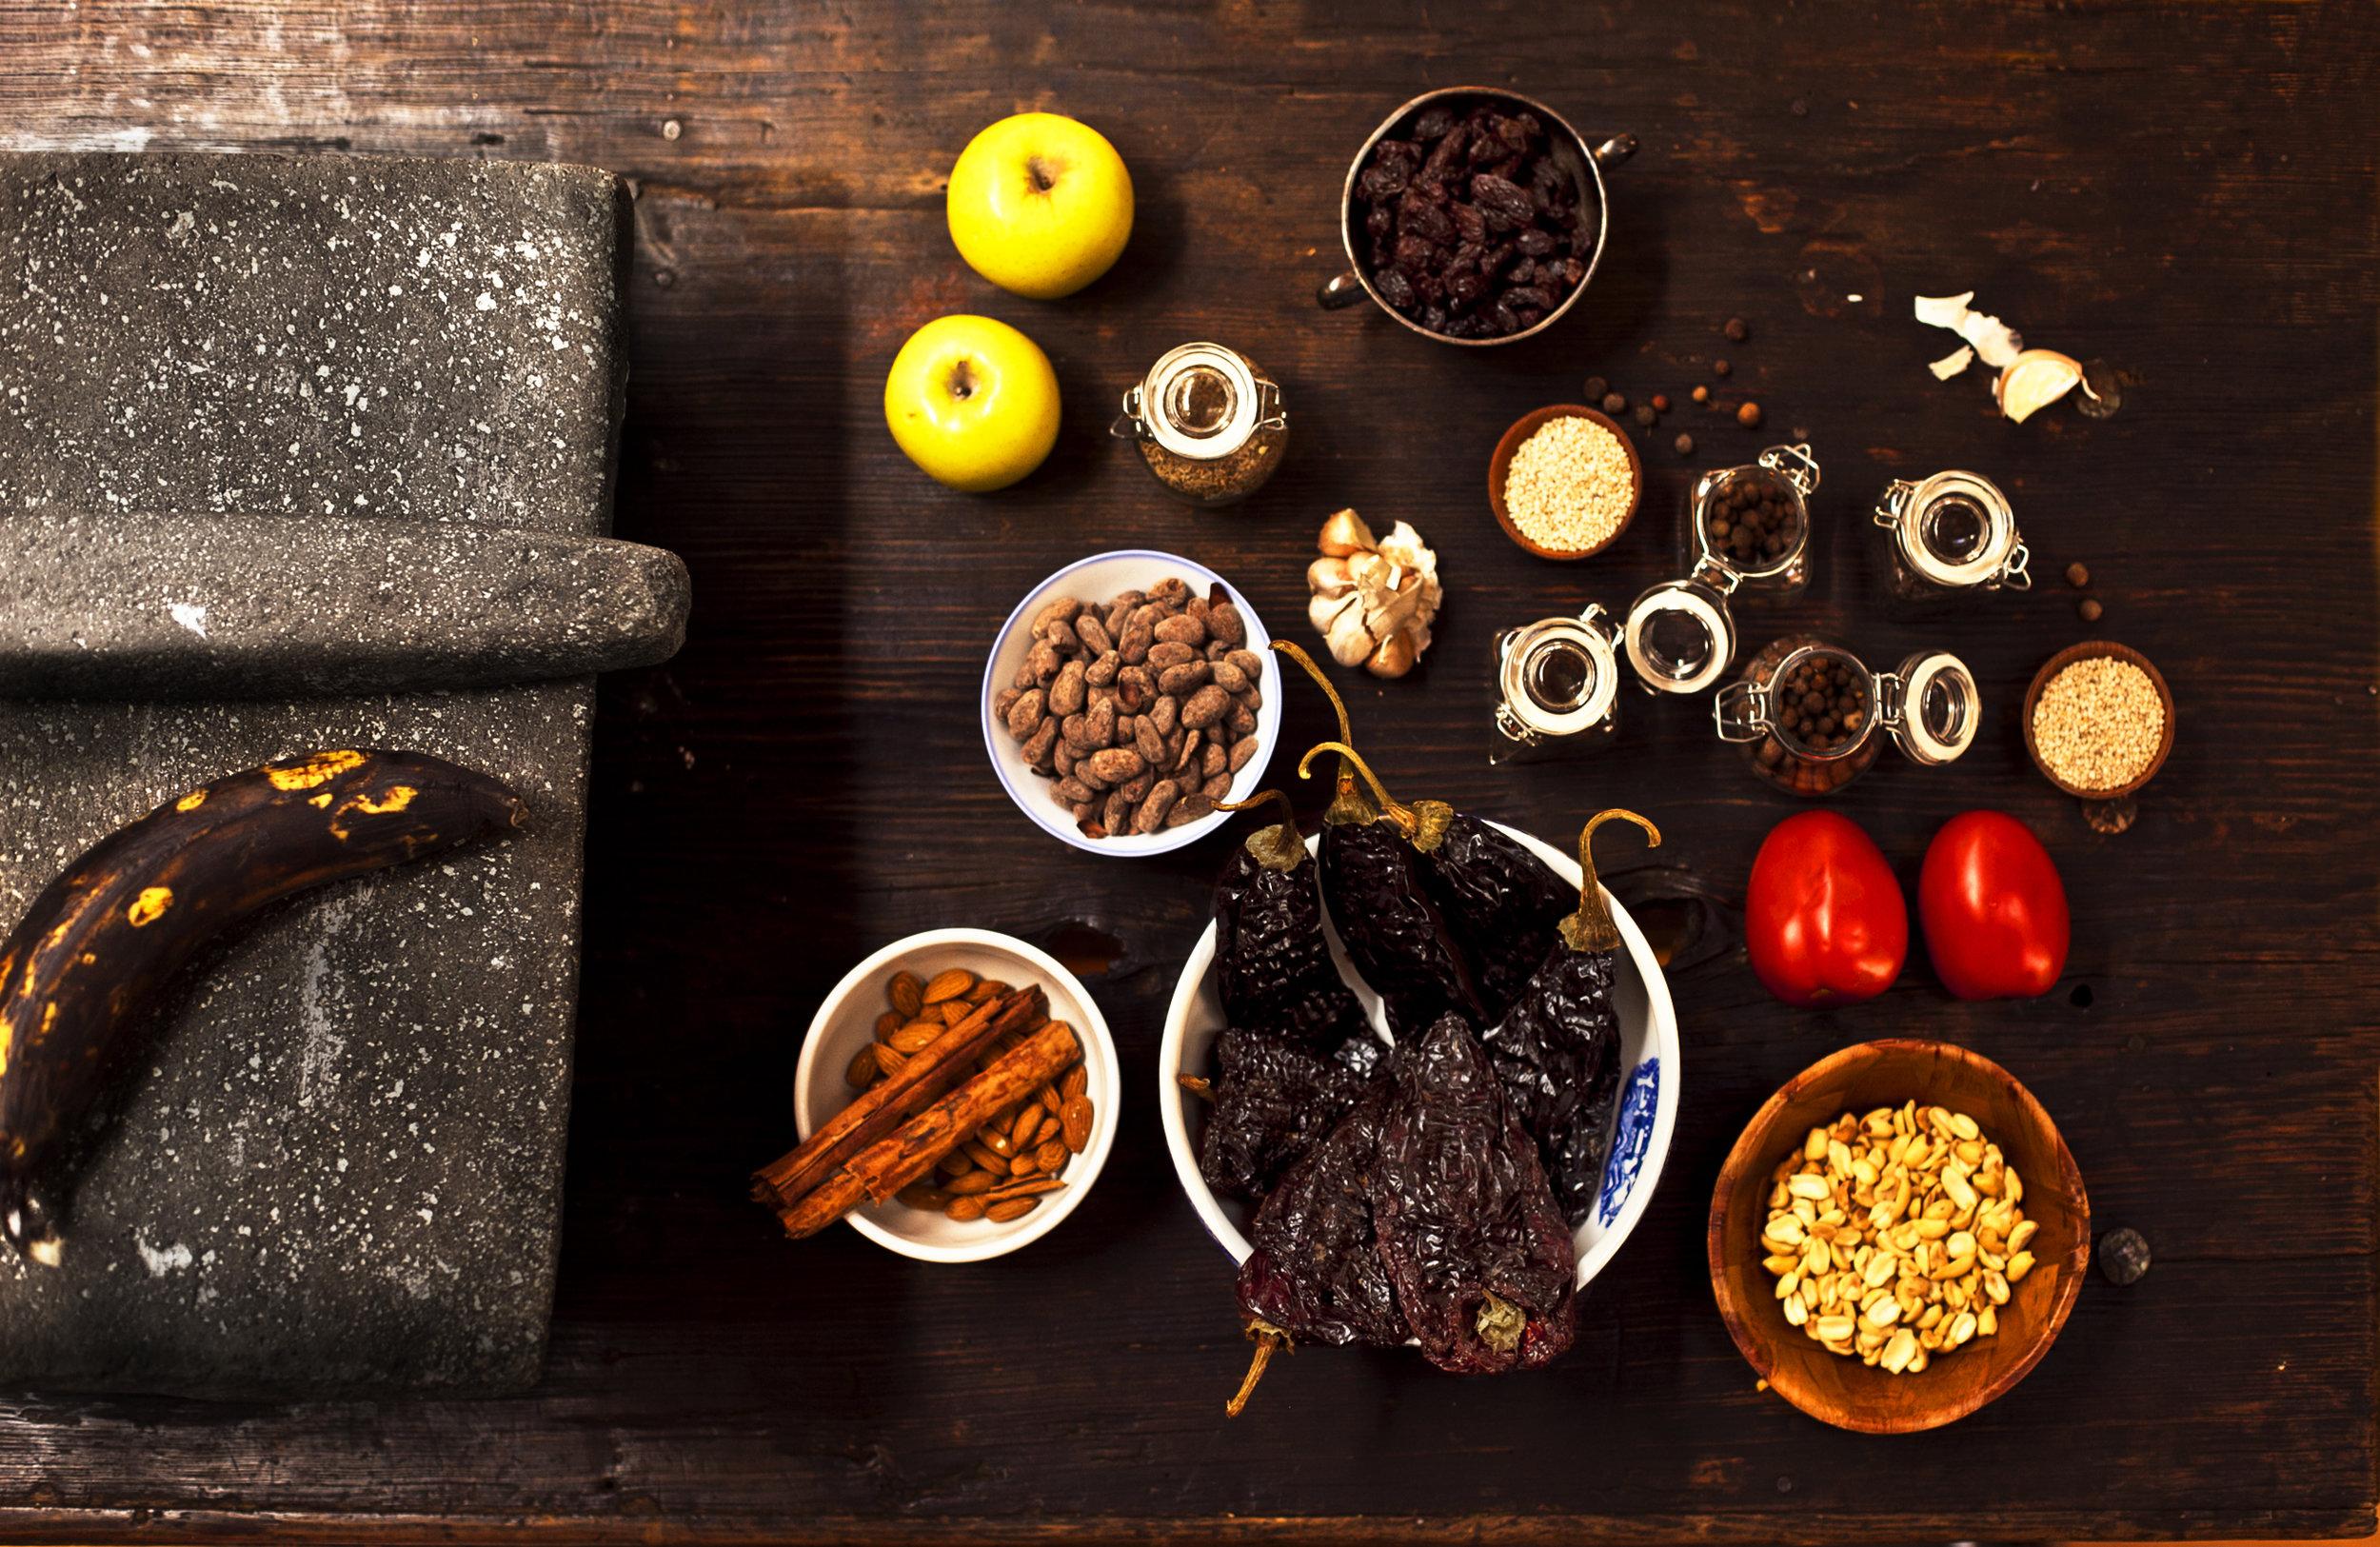 Ingredients for making salsa.